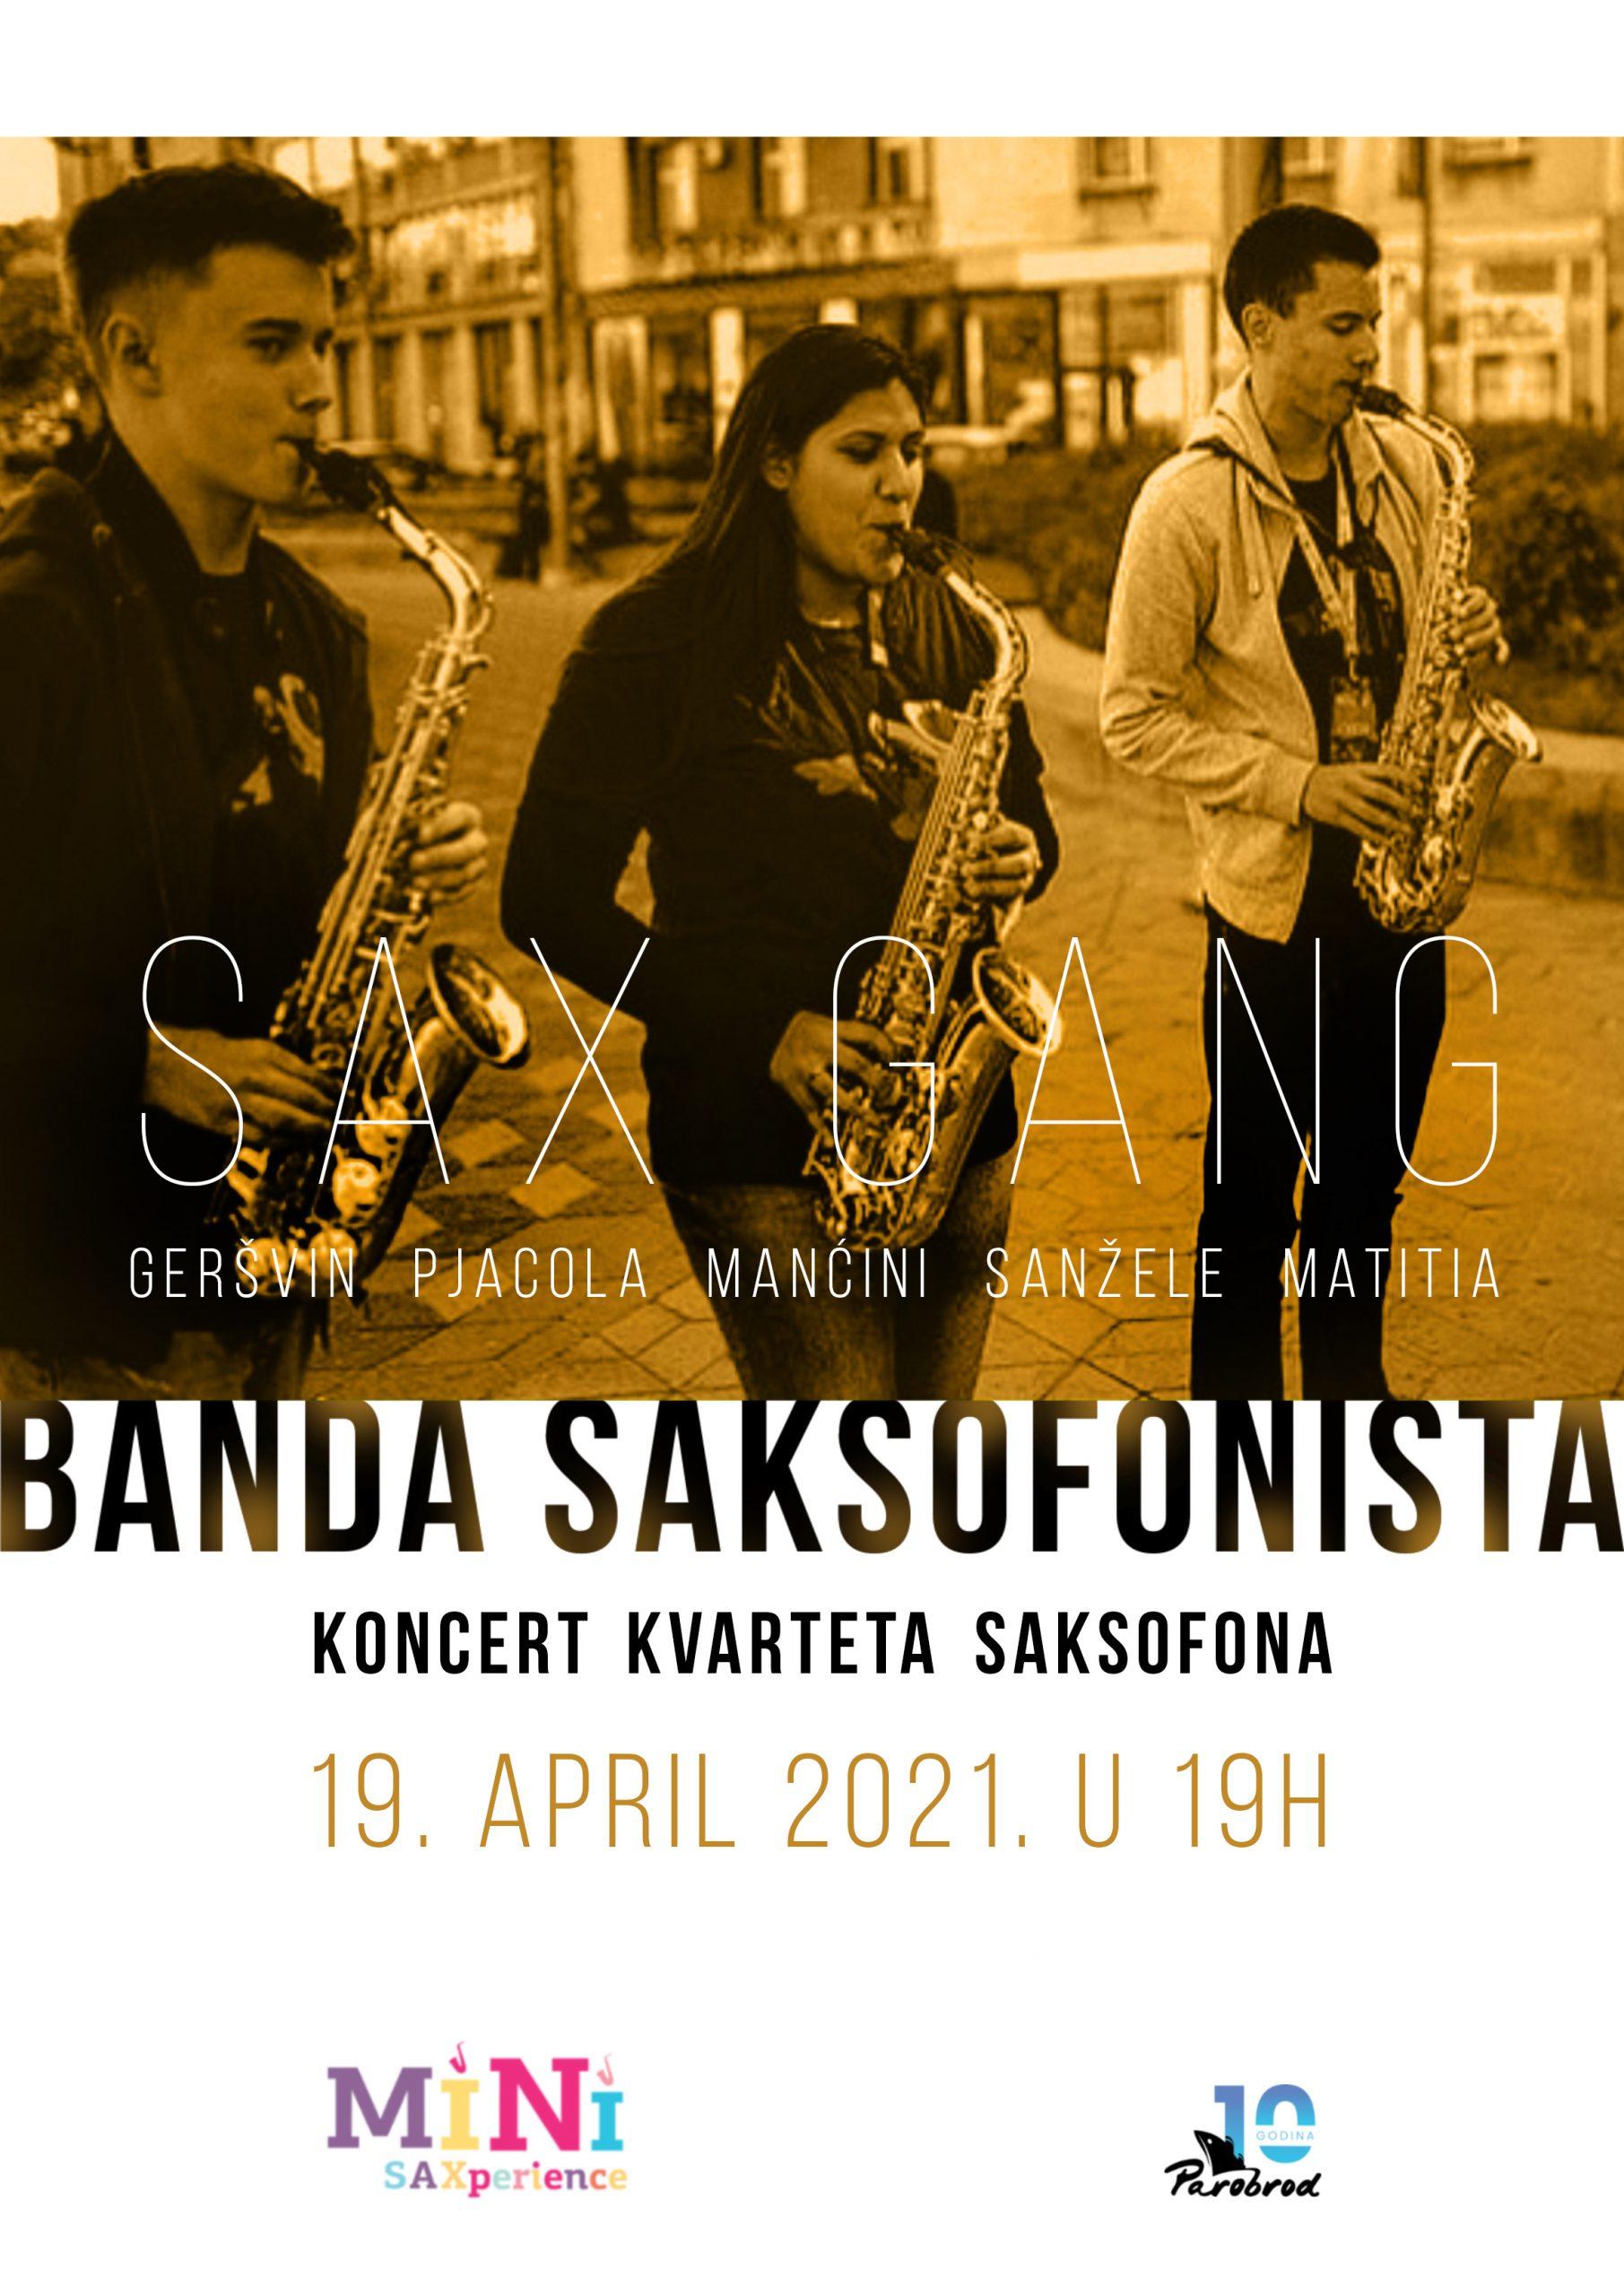 "Koncert kvarteta sasksofona ""Banda saksofonista"""